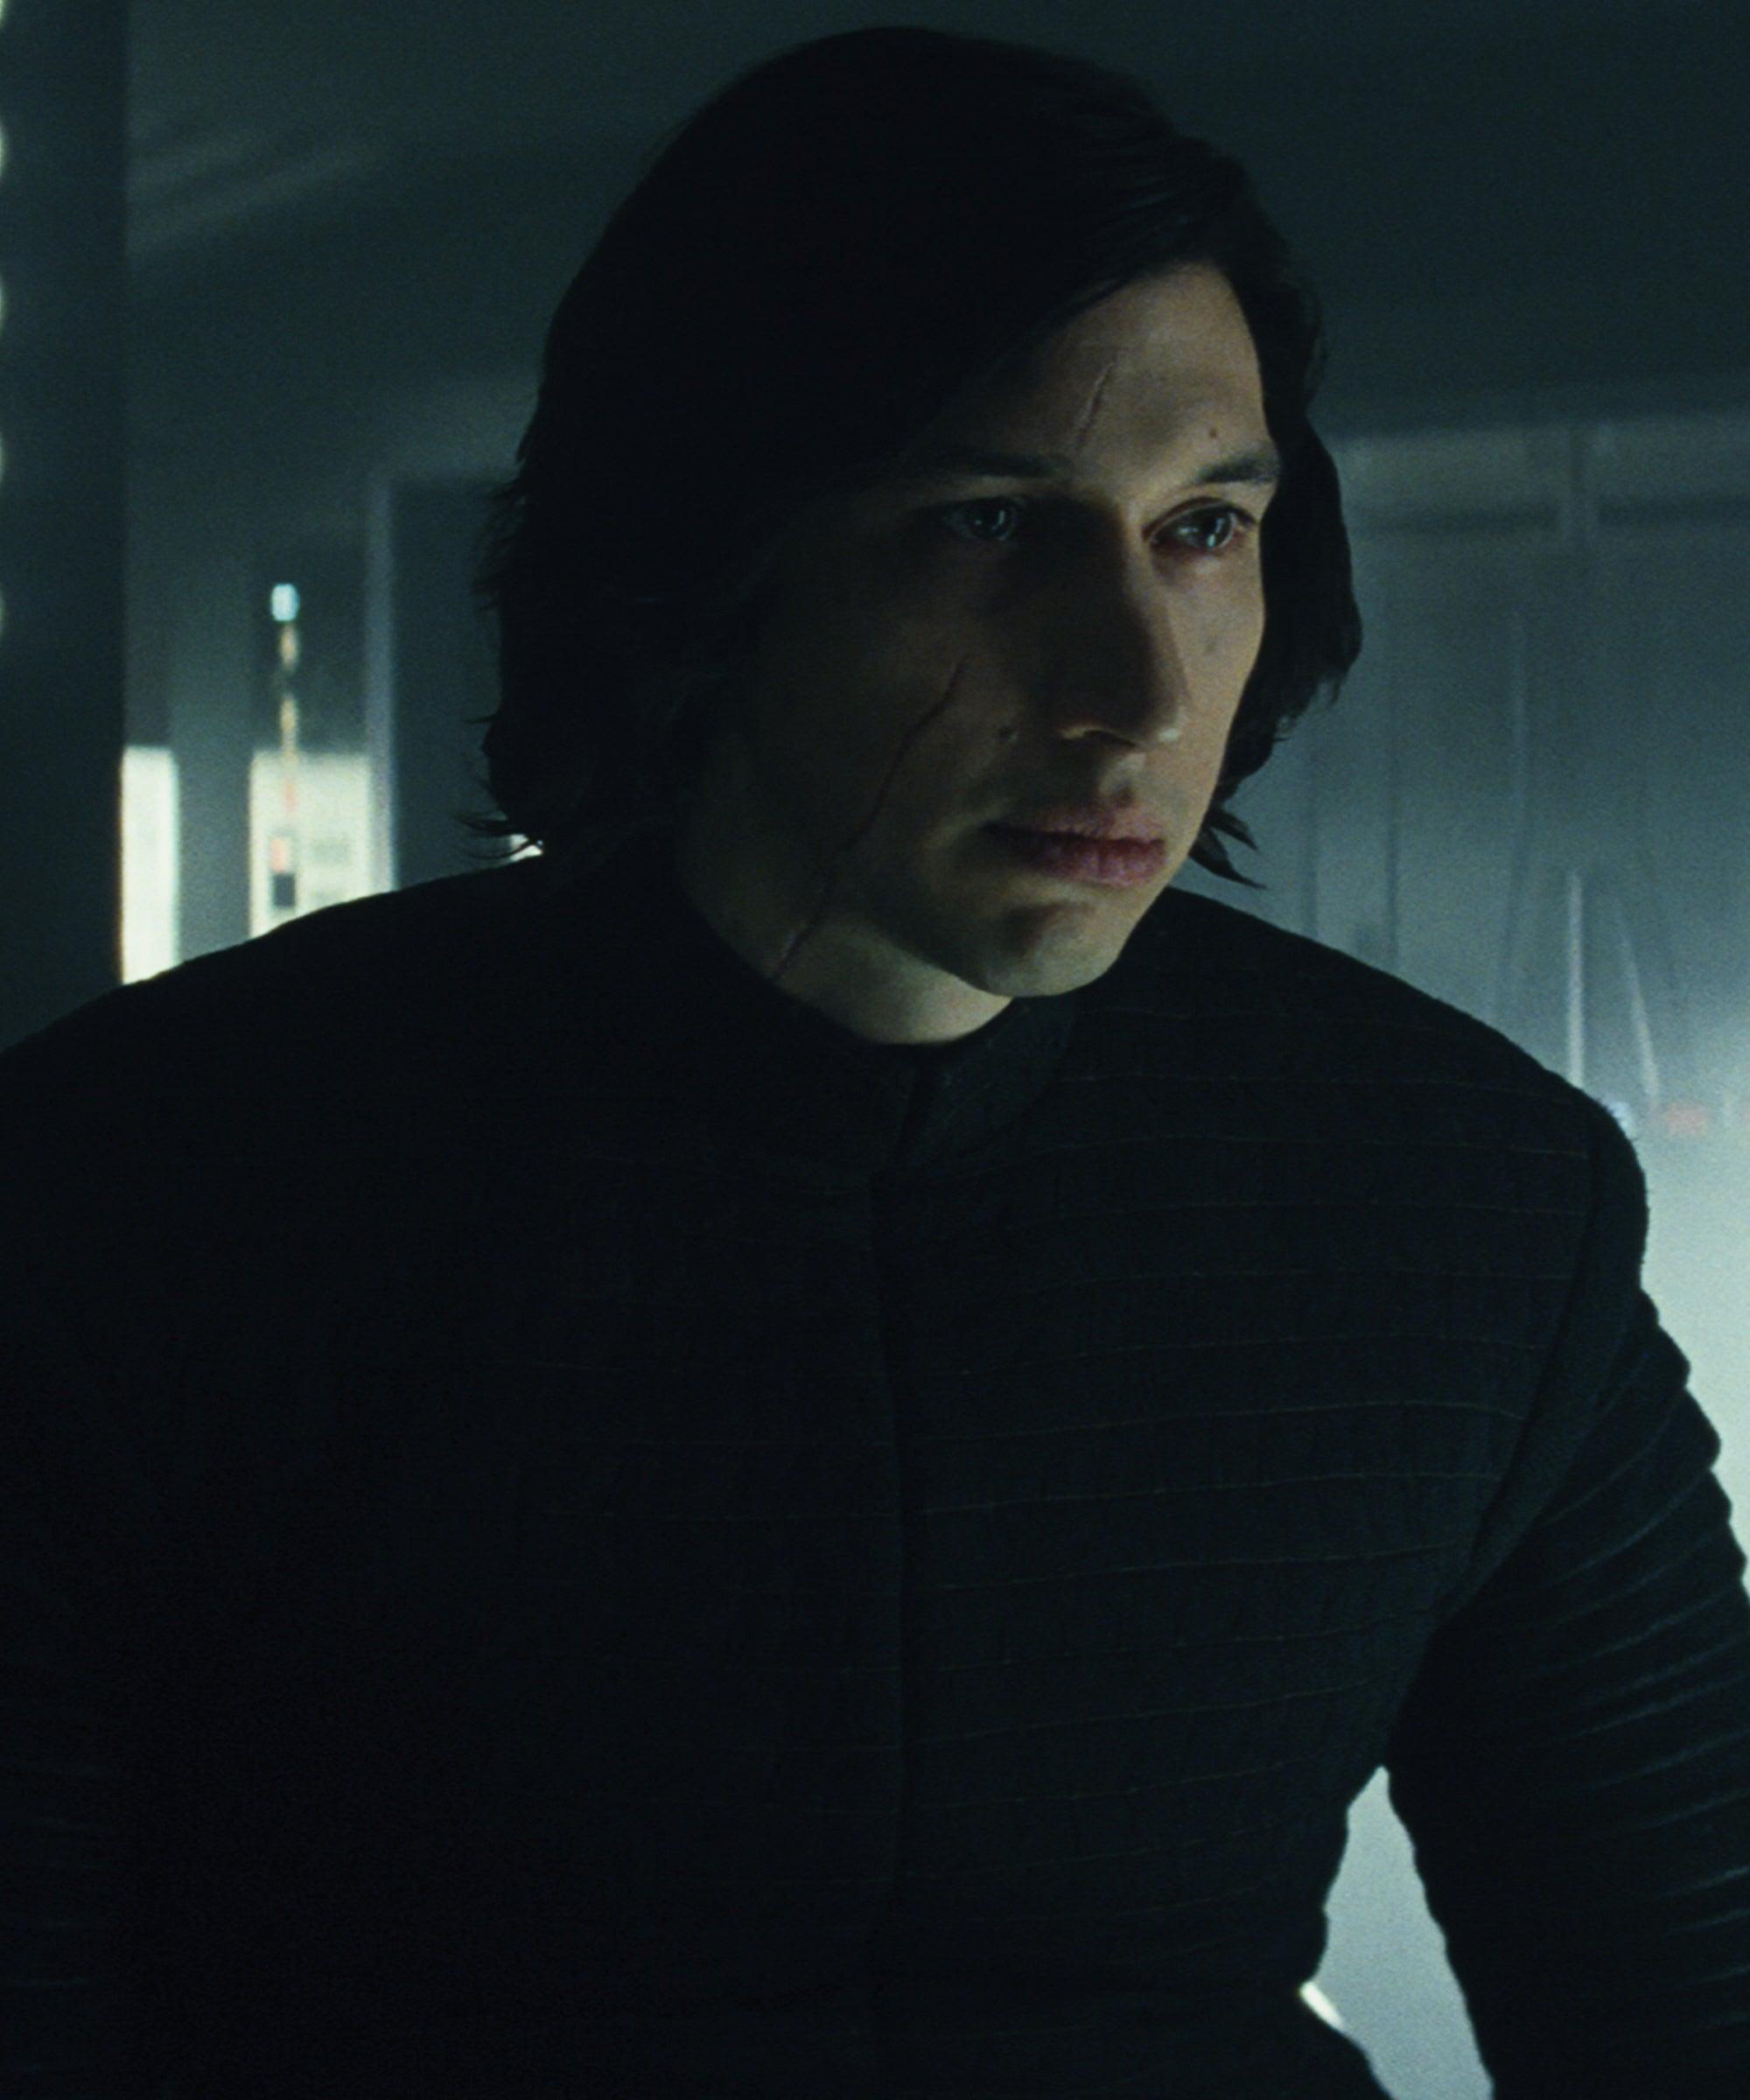 Unpacking Ben Solo Aka Kylo Ren S Star Wars Ep 9 Ending